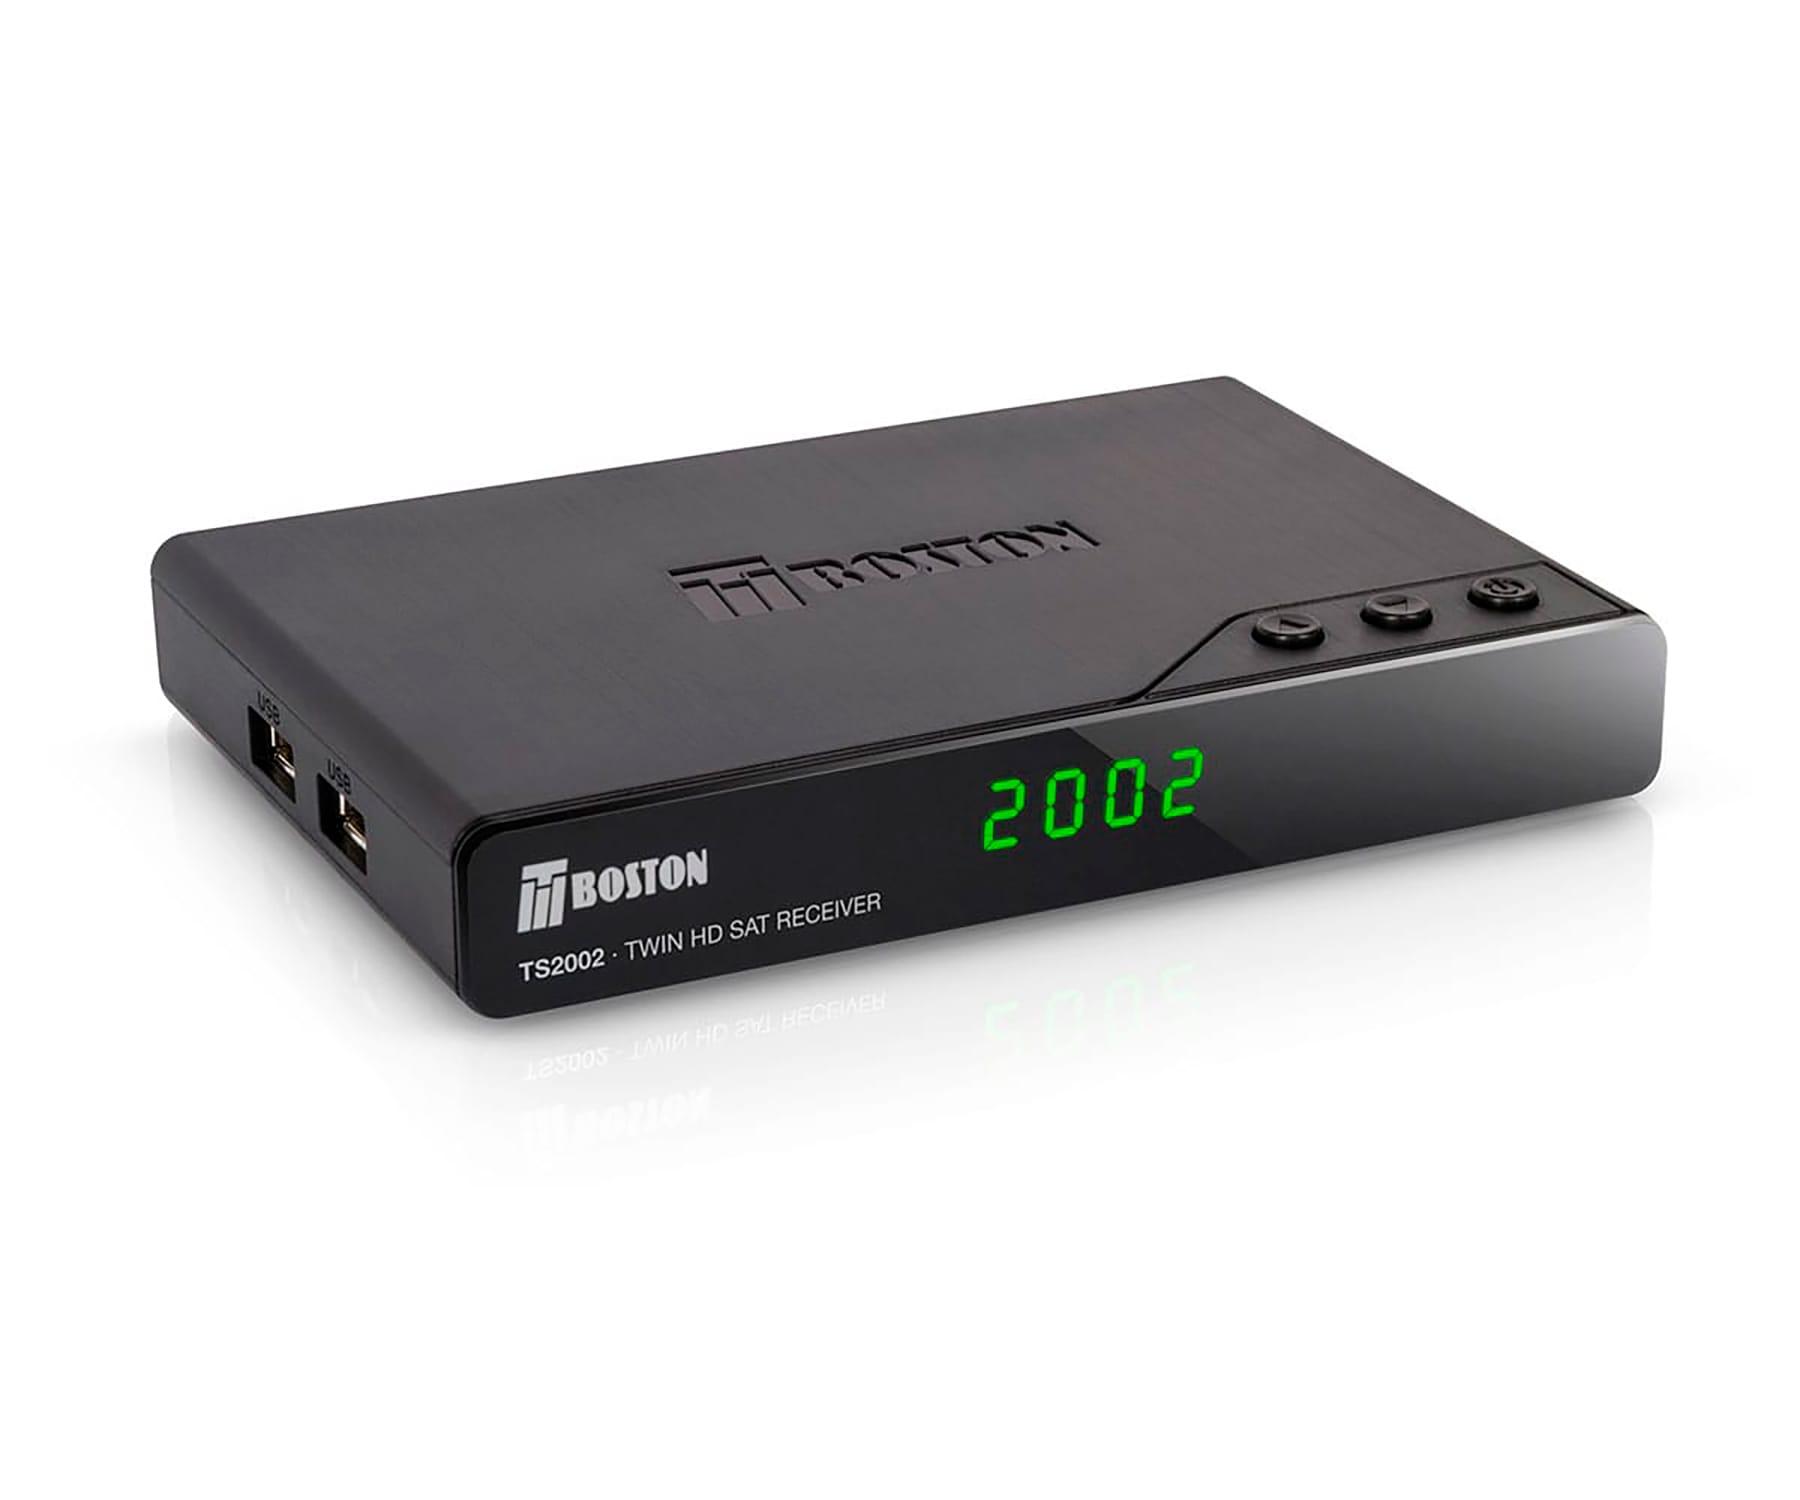 TBOSTON TS2002 RECEPTOR SATÉLITE HD TWIN DVB-S2 HD ANTENA WIFI USB PVR TIMESHIFT USB REPRODUCTOR MULTIMEDIA